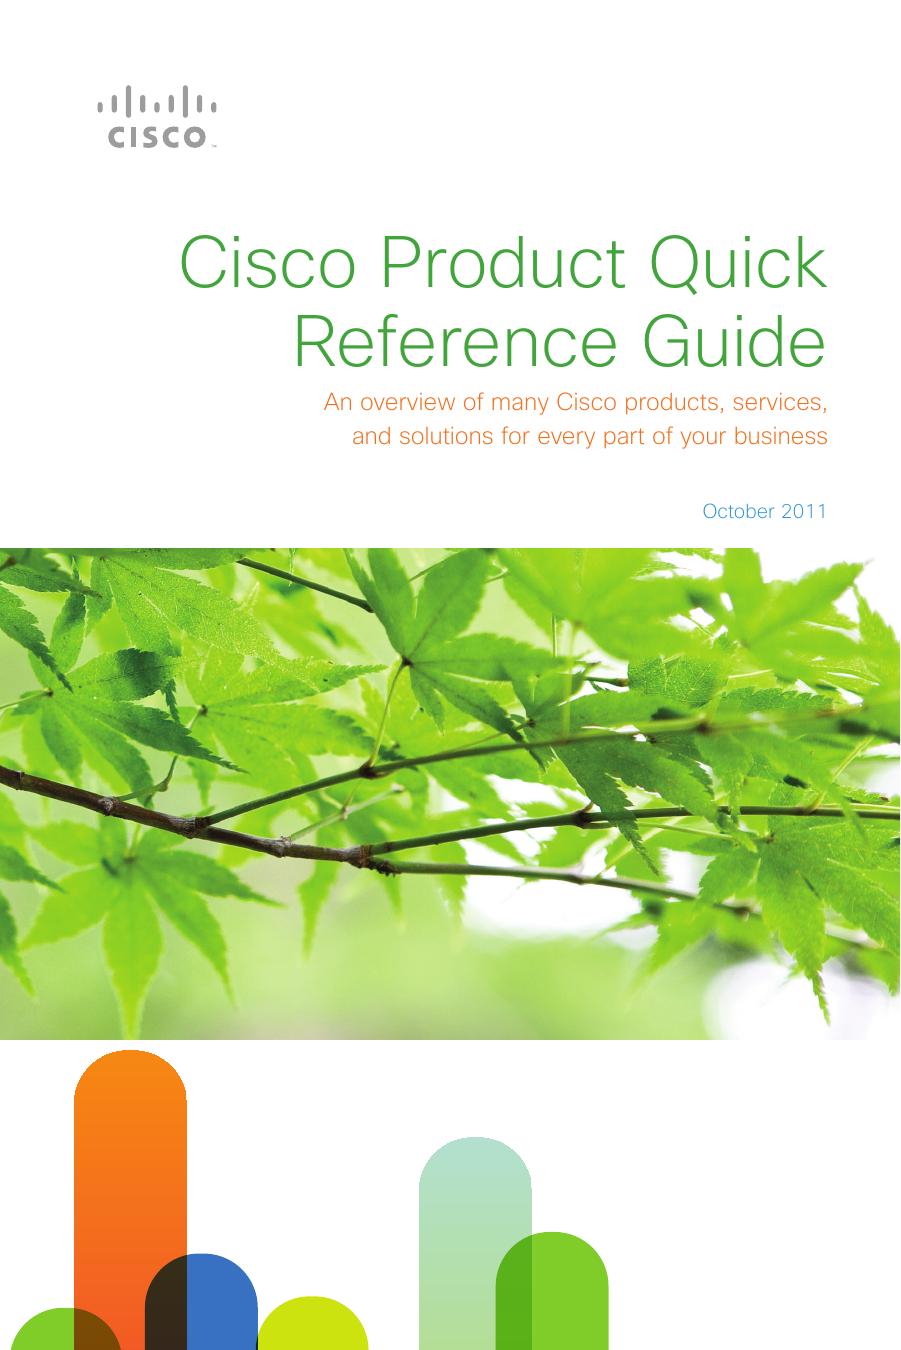 Cisco Product Quick Reference Guide | manualzz com